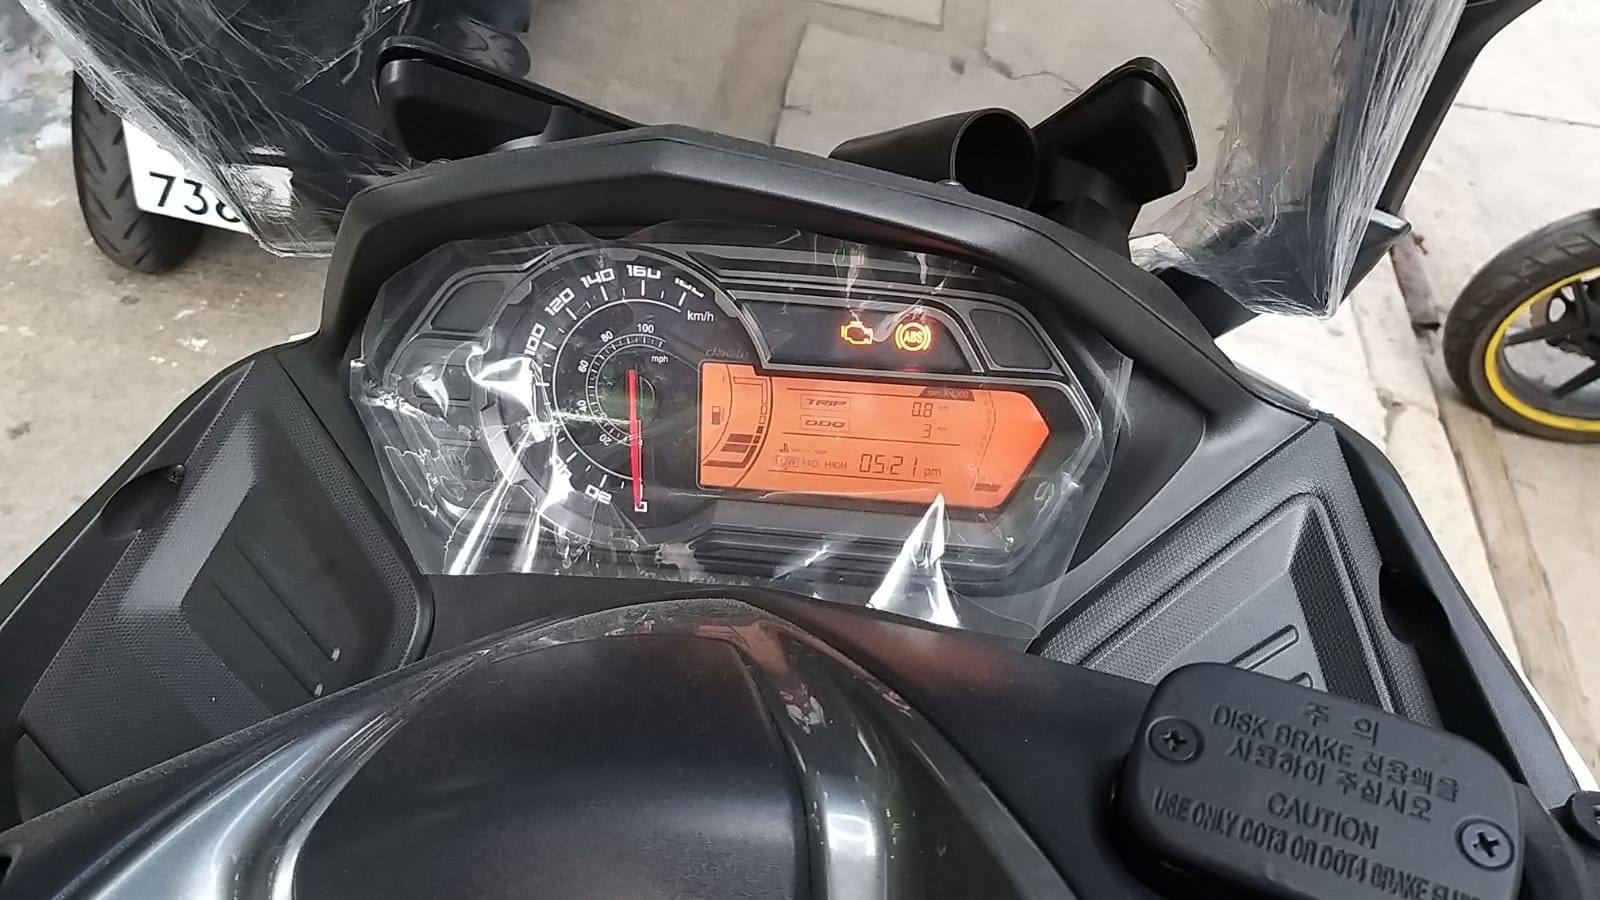 DAELIM XQ250 新車 2019年 - 「Webike摩托車市」